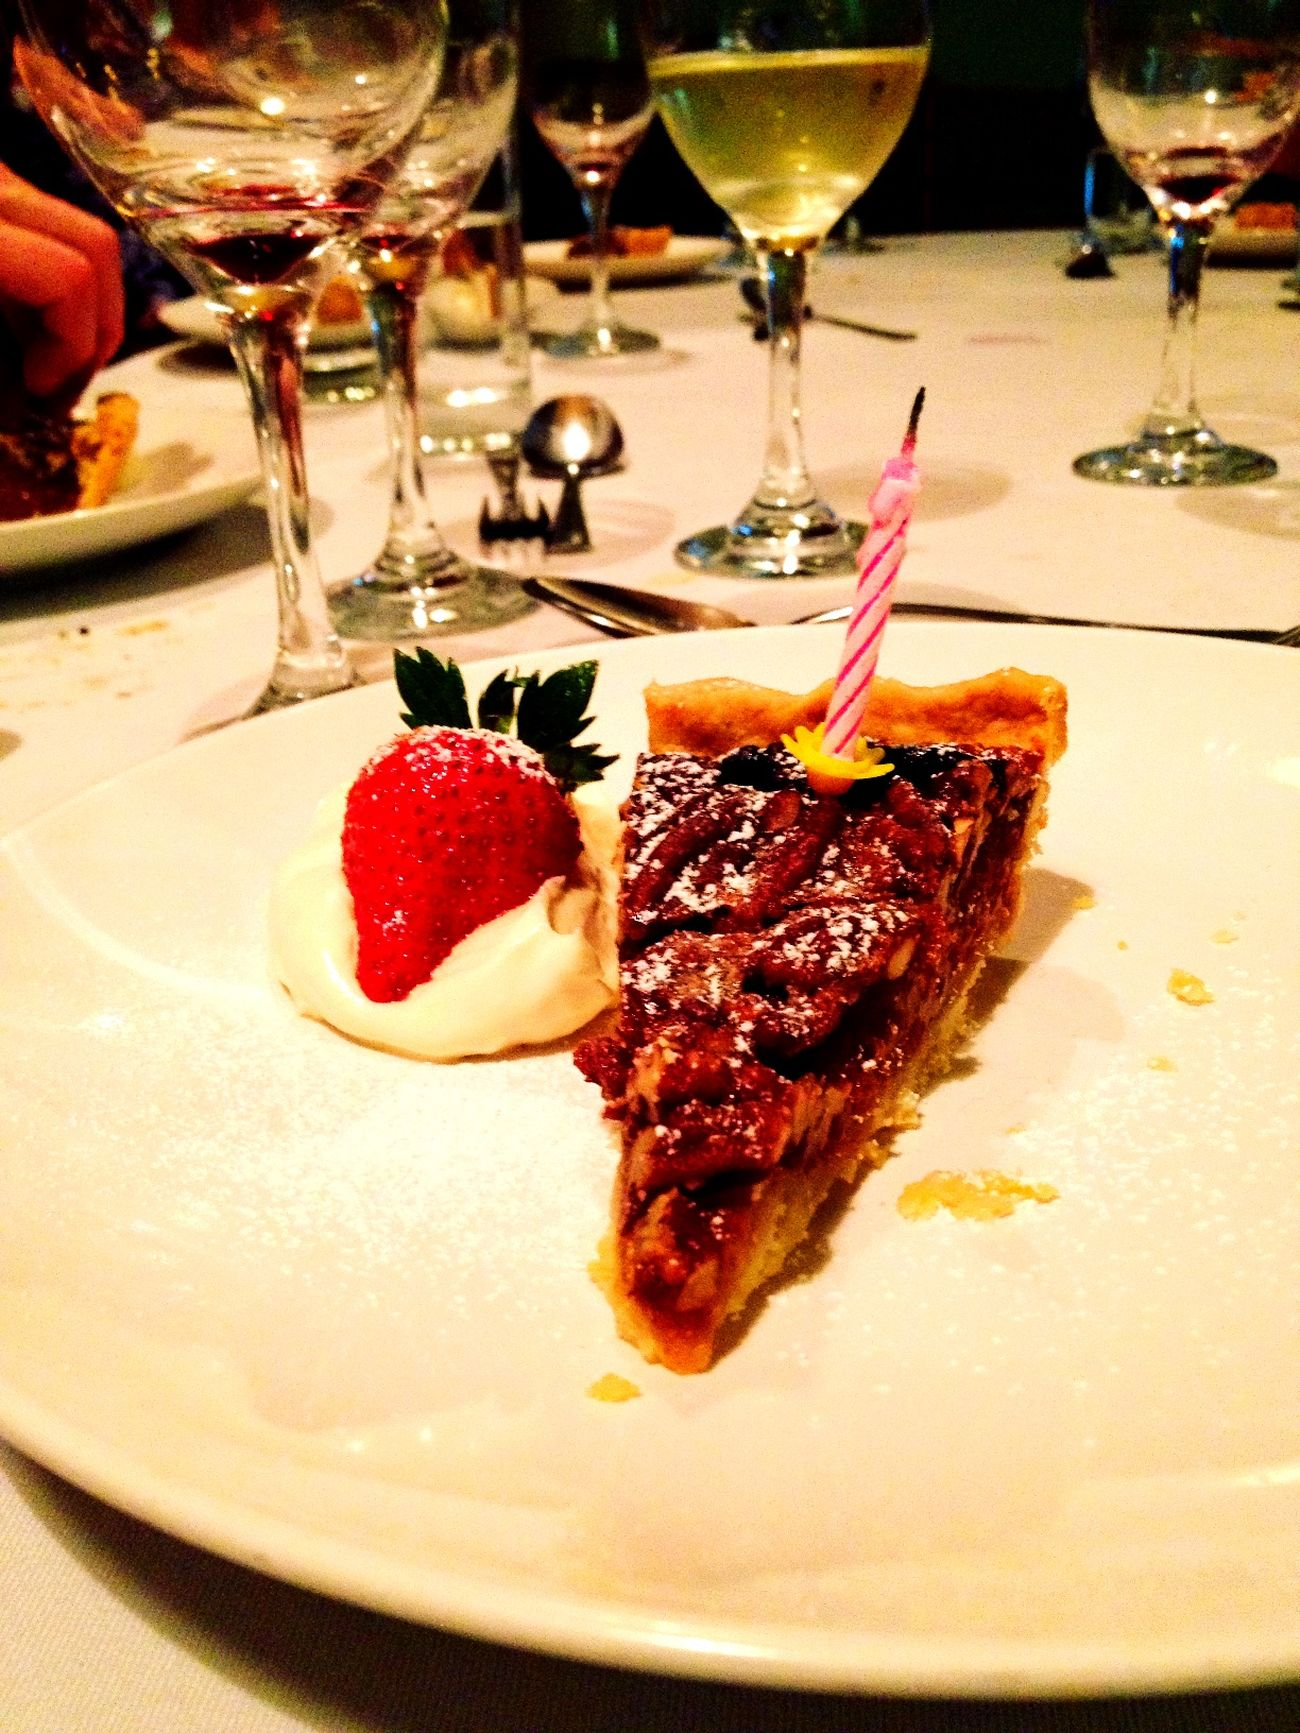 Birthdaying at Magnolia Birthdaying